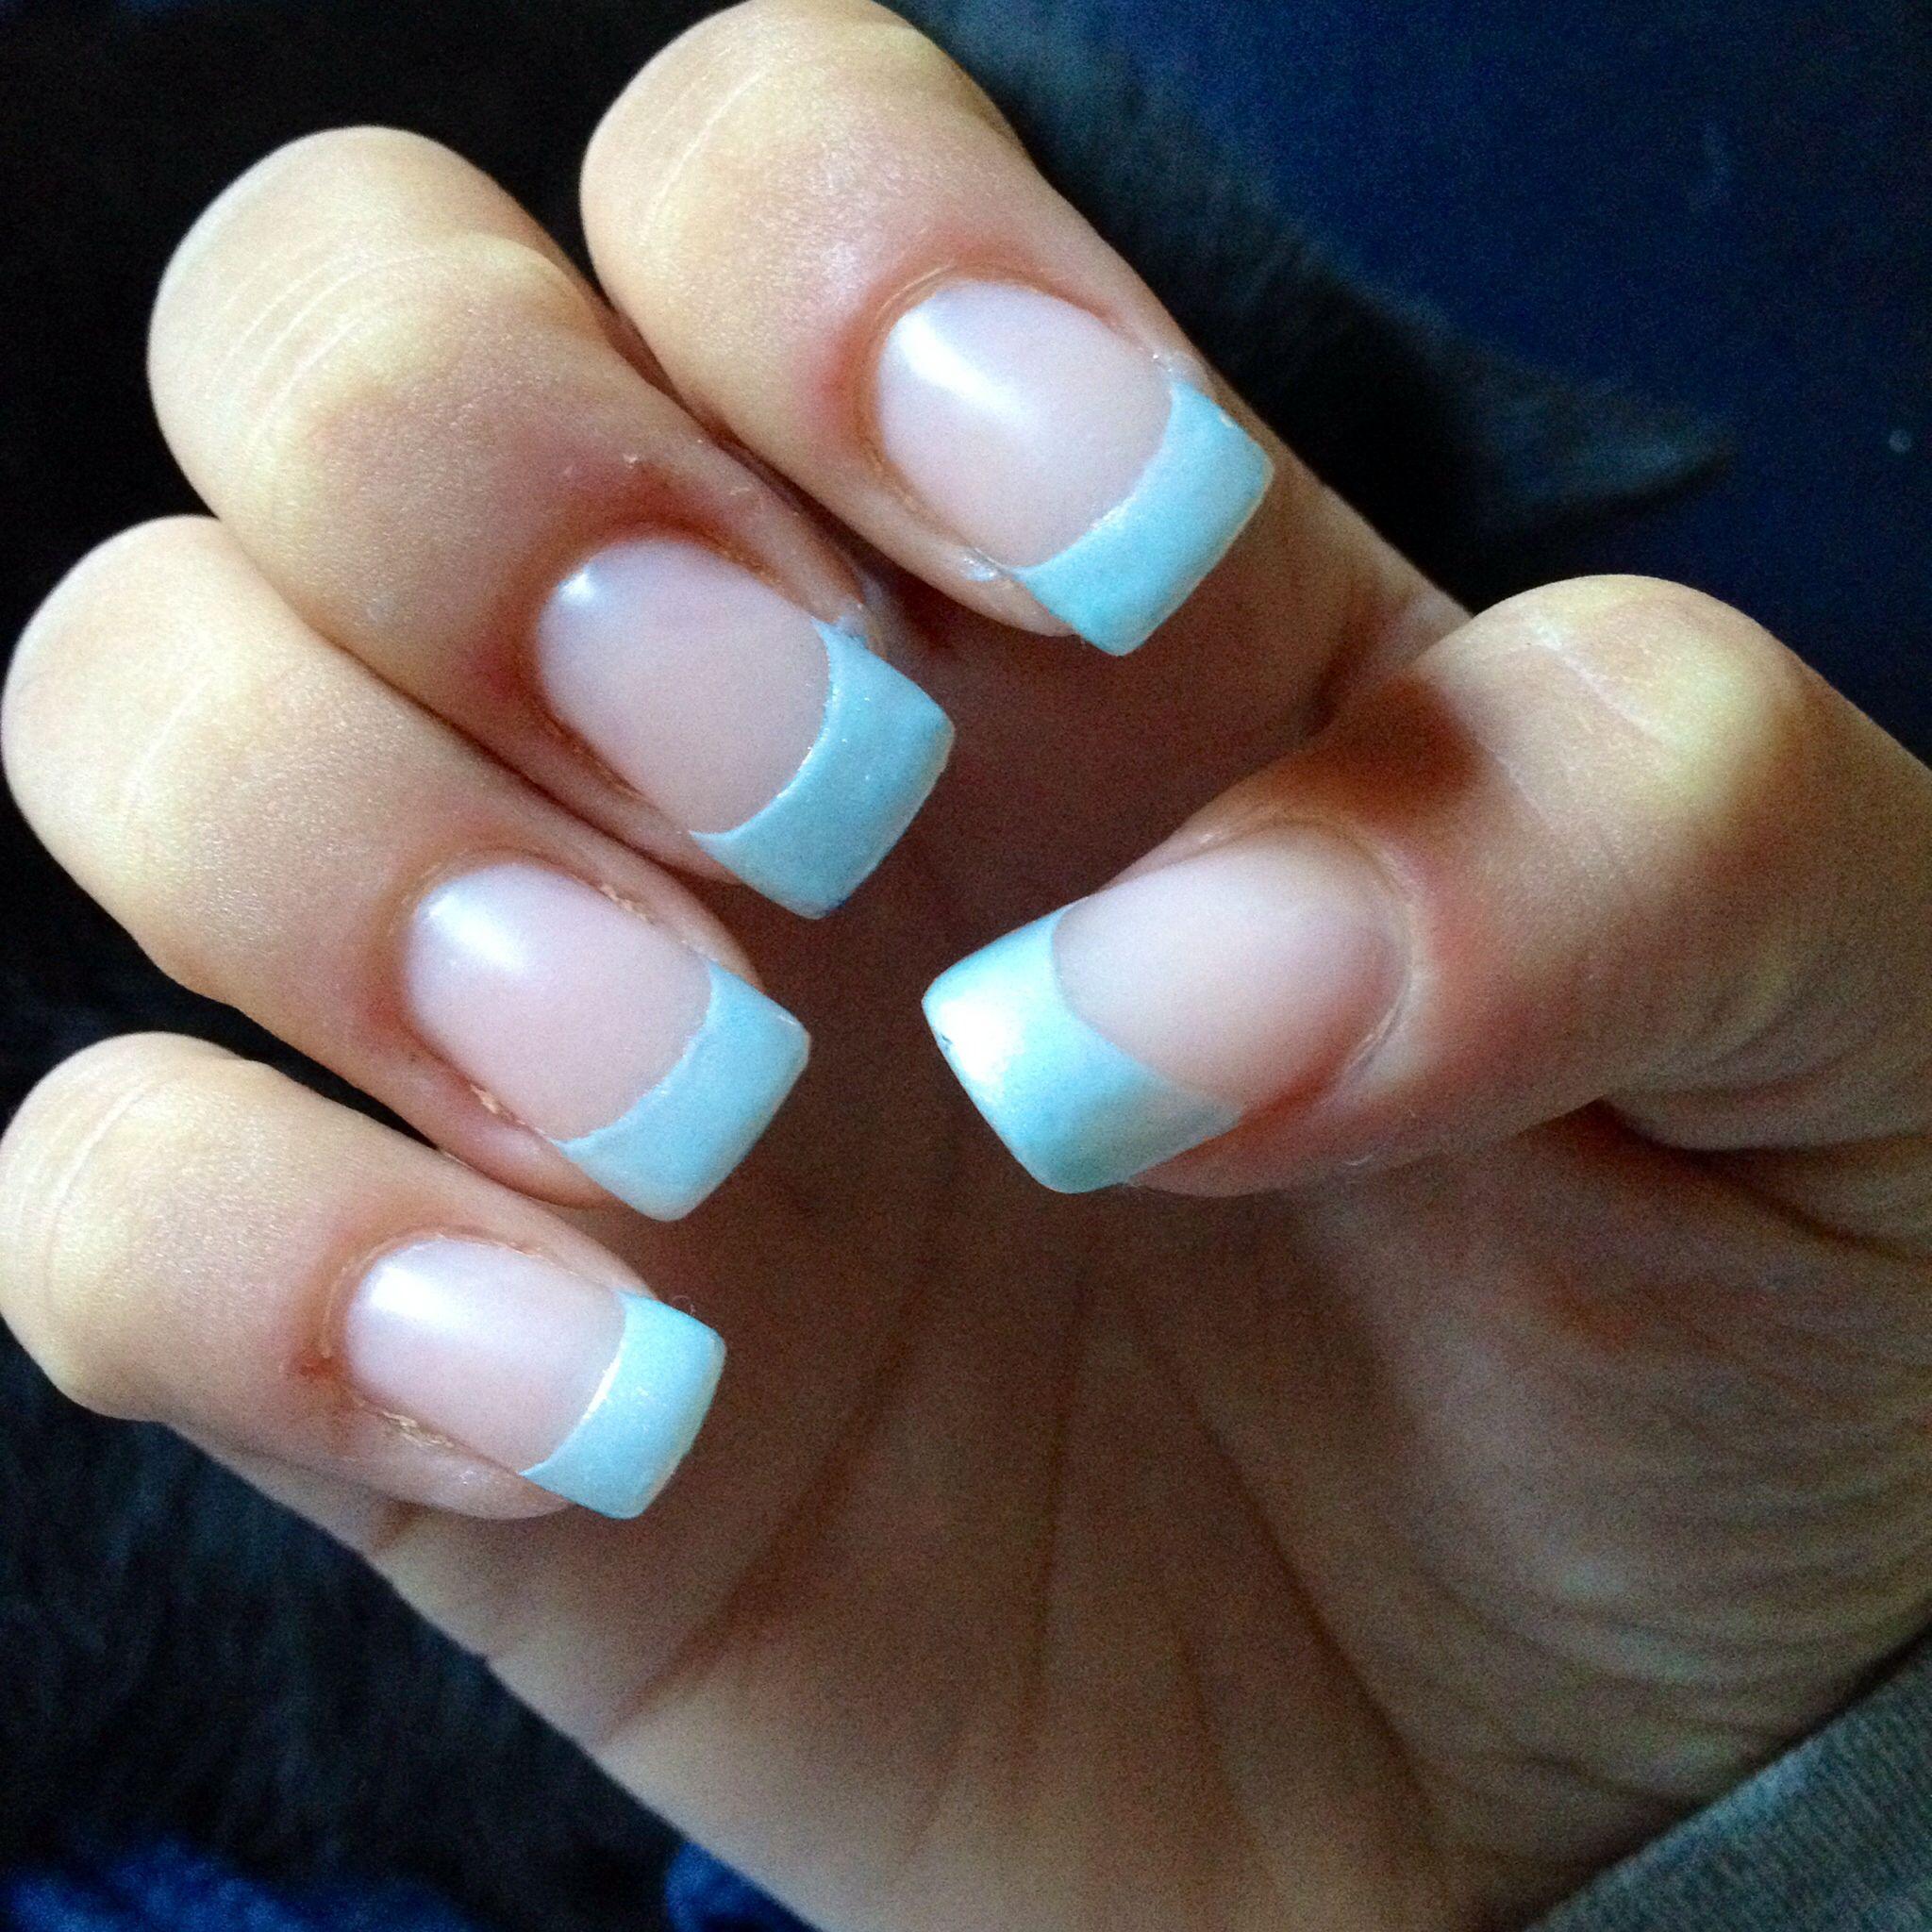 Simple Light Blue Acrylic Nail Tip Design Super Super Cute Acrylic Nail Tips Nail Tip Designs Blue Acrylic Nails